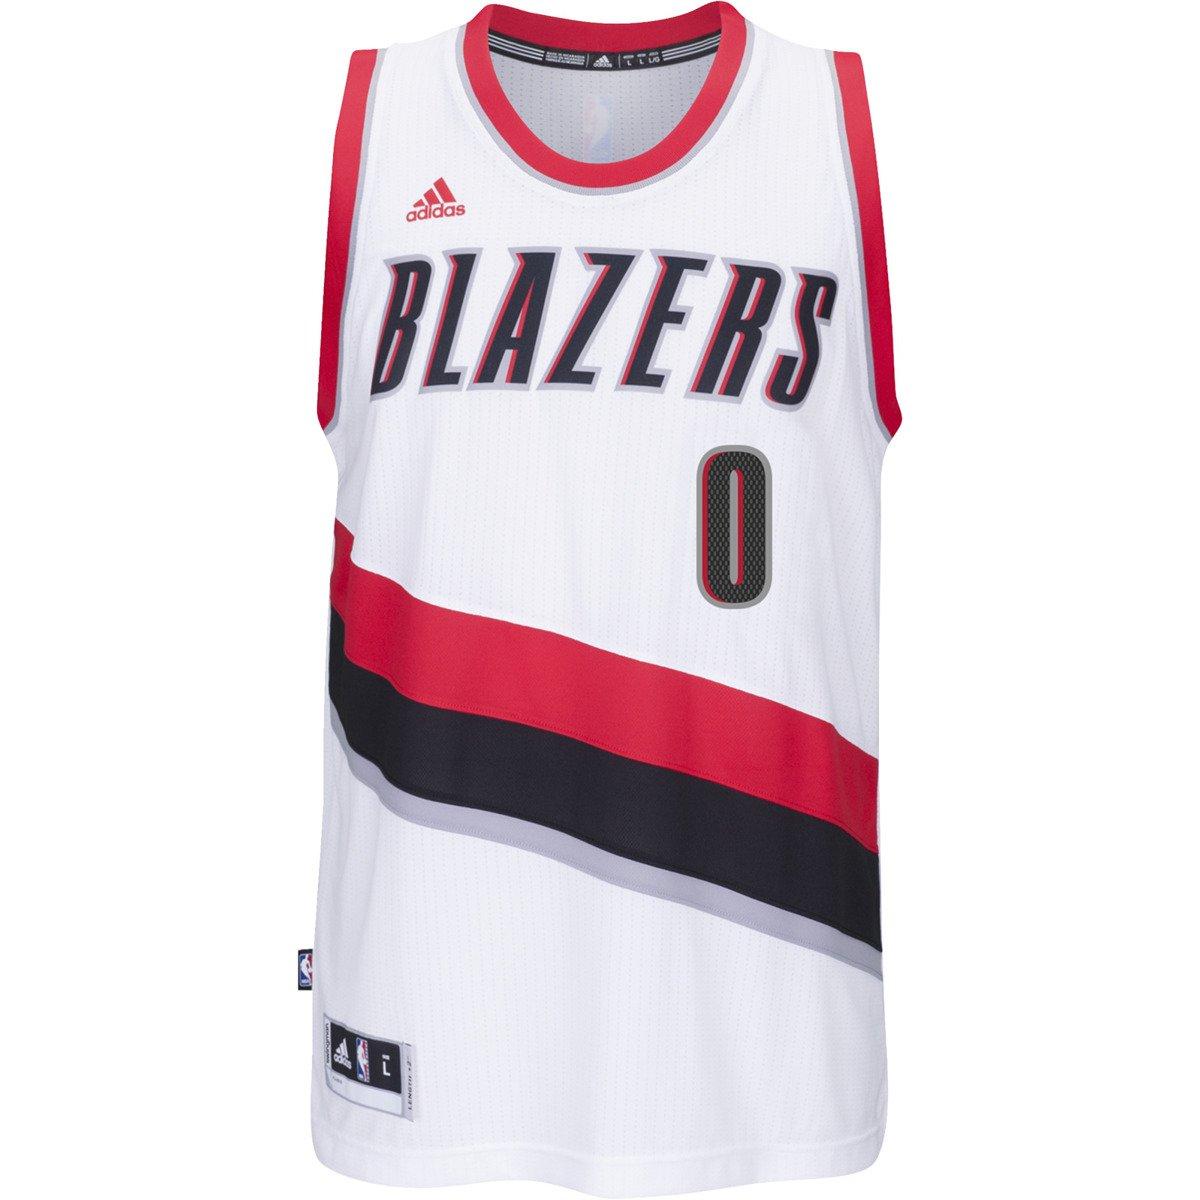 Portland Nba: Adidas Swingman NBA Portland D.Lillard- A46234